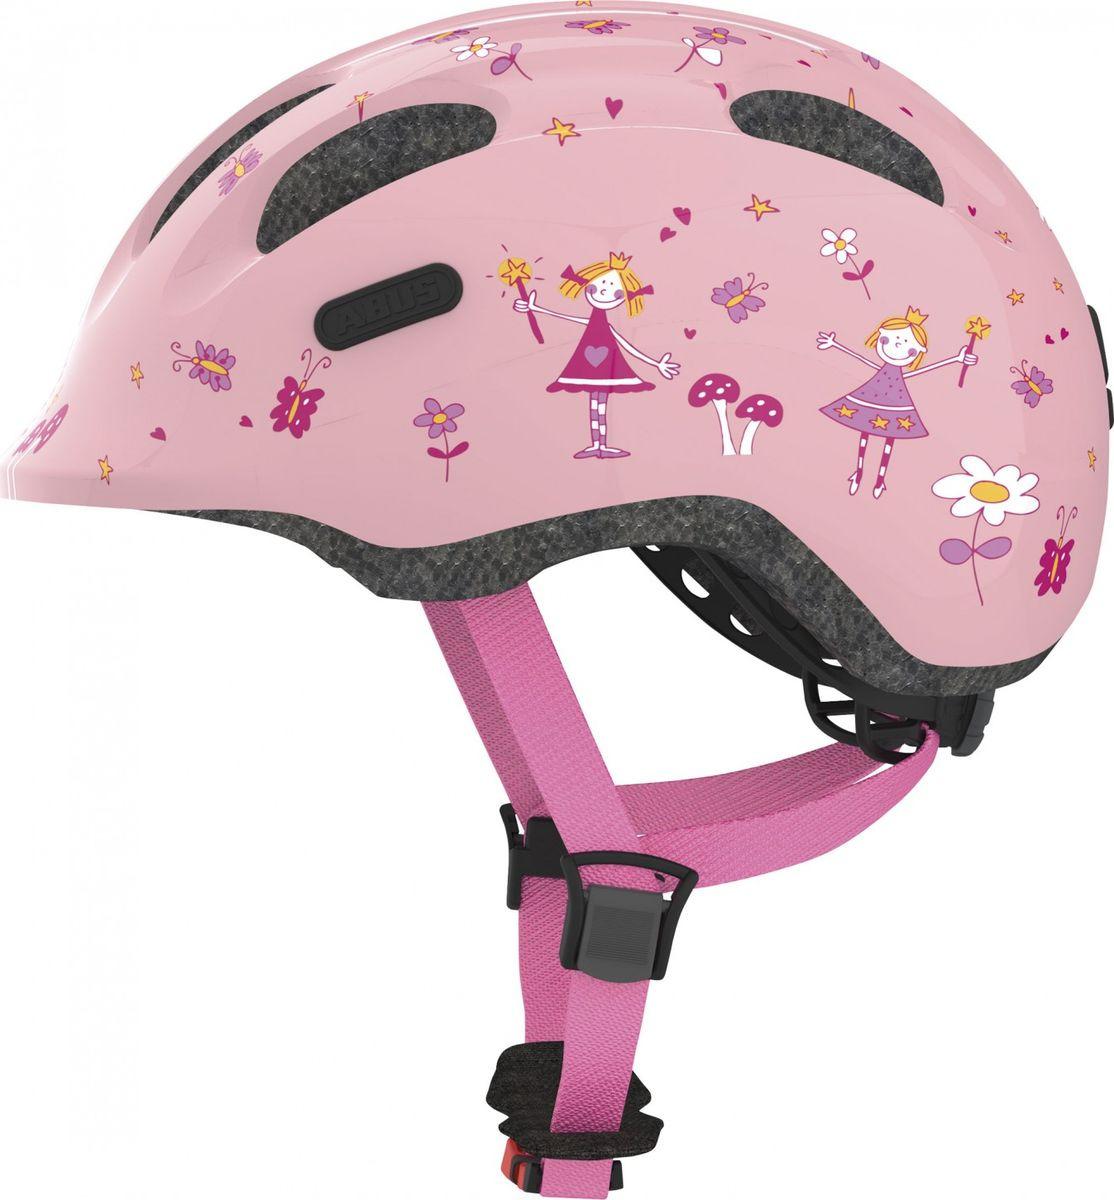 Шлем защитный Abus Smiley 2.0 Принцесса, розовый, размер S (45-50) велошлем детский abus smiley пчелы размер m 50 55